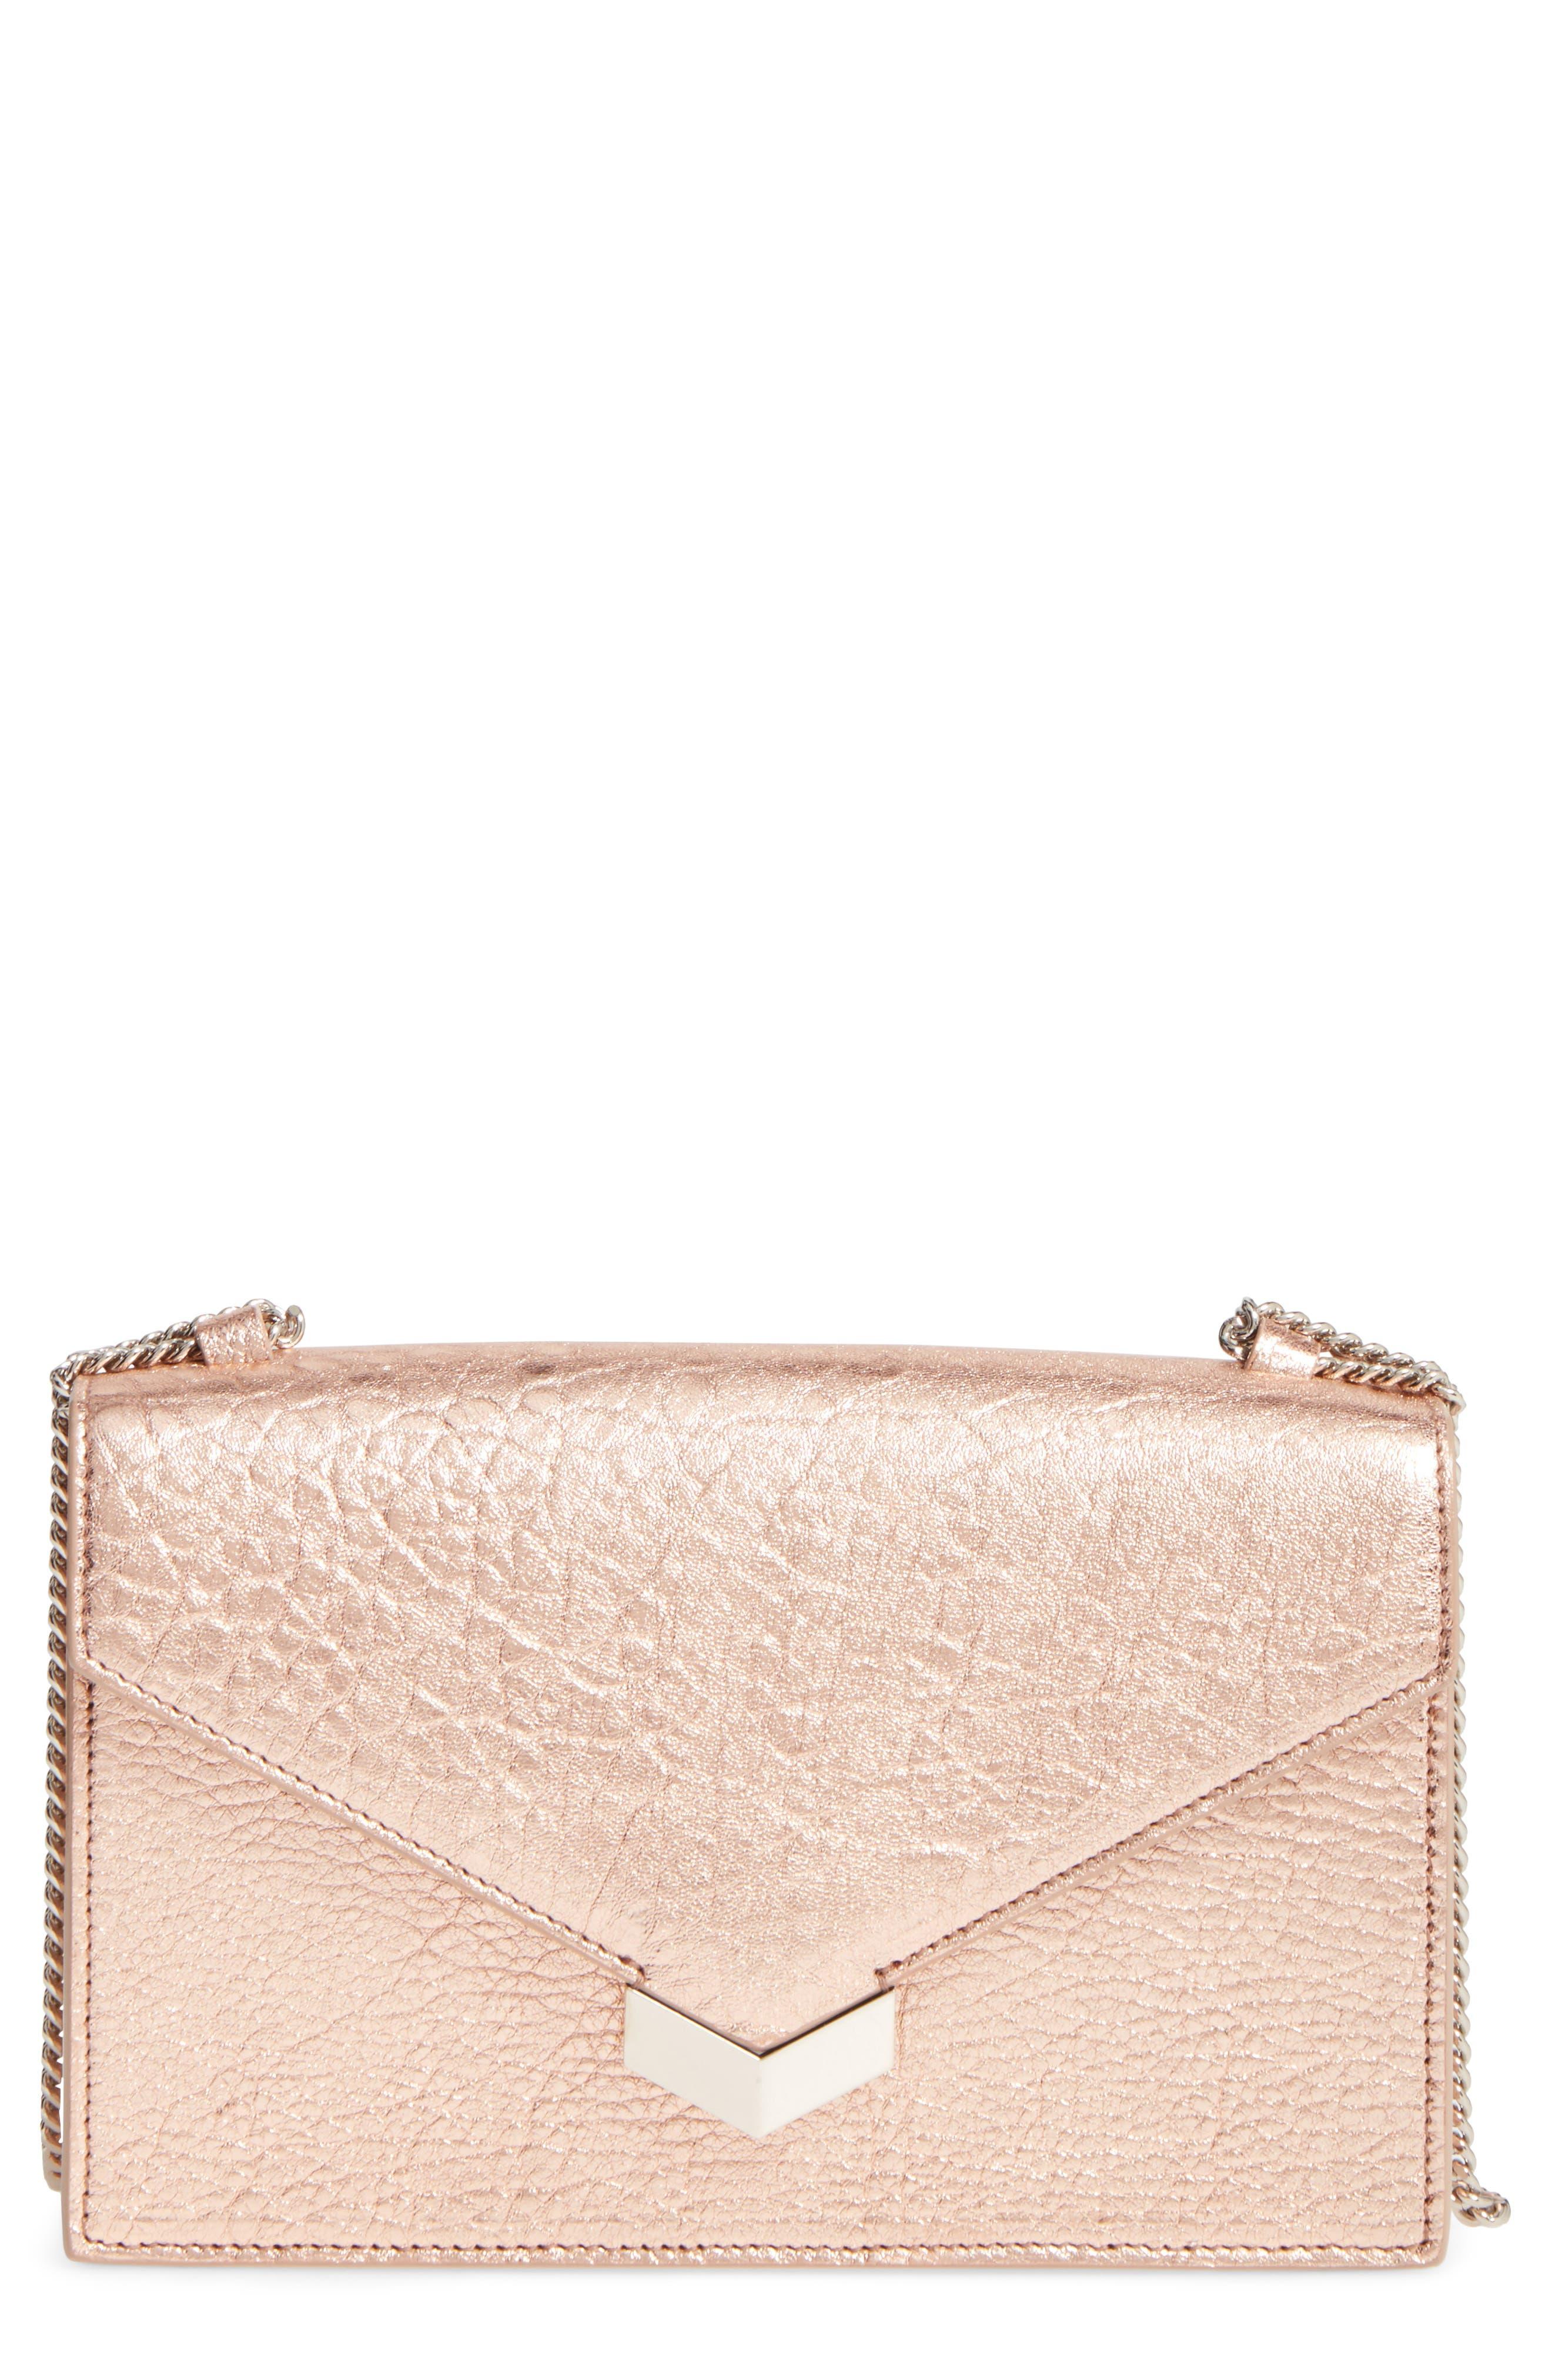 Alternate Image 1 Selected - Jimmy Choo Leila Grainy Lambskin Leather Crossbody Bag